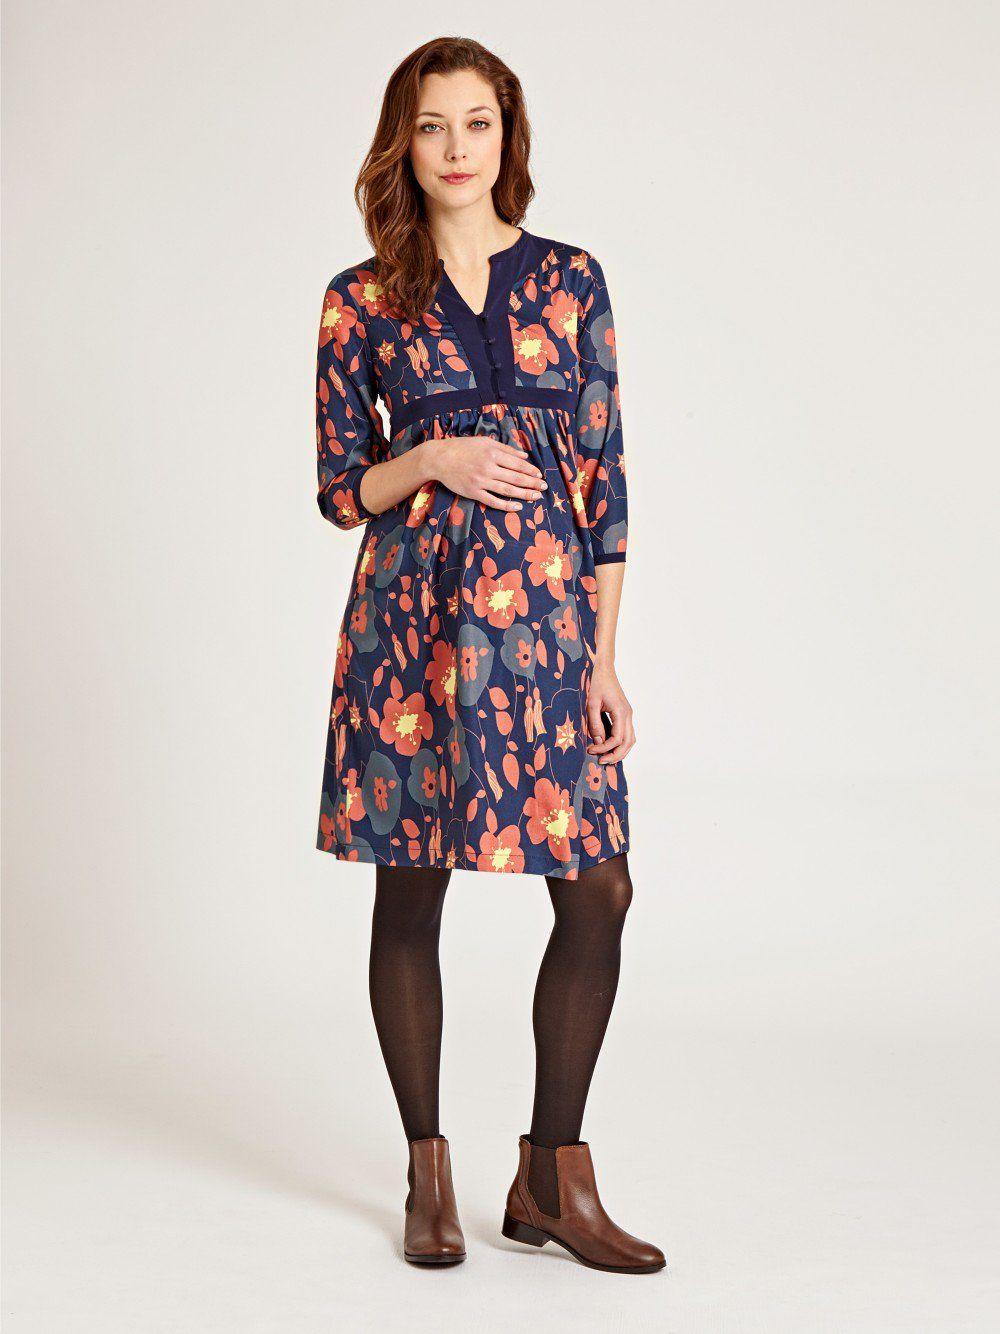 8a29897762af8 Navy Floral Maternity Dress | JoJo Maman Bebe #maternity #maternitystyle